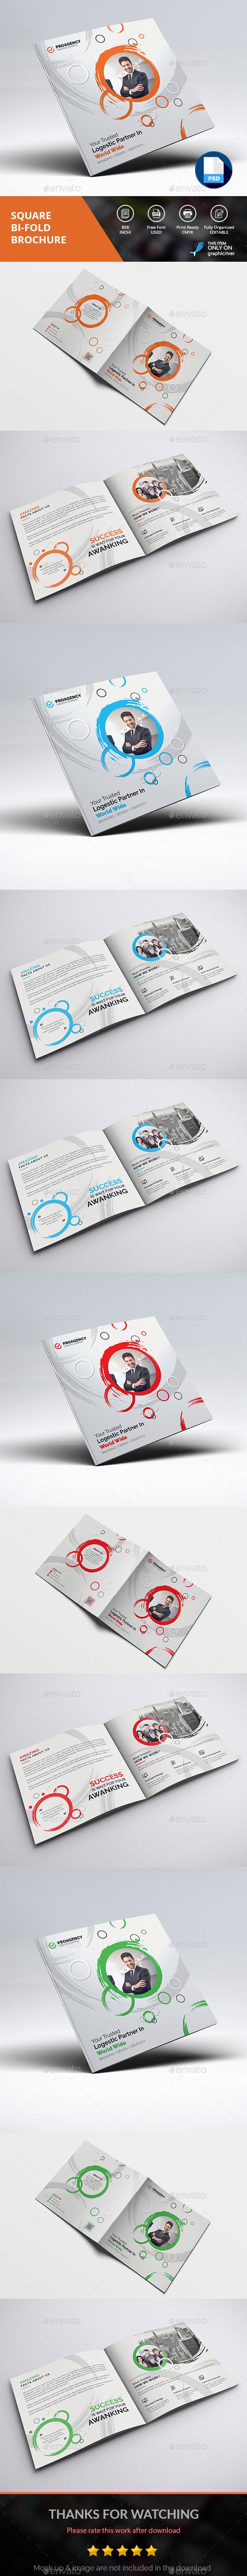 Creative Square Brochure - Brochures Print Templates